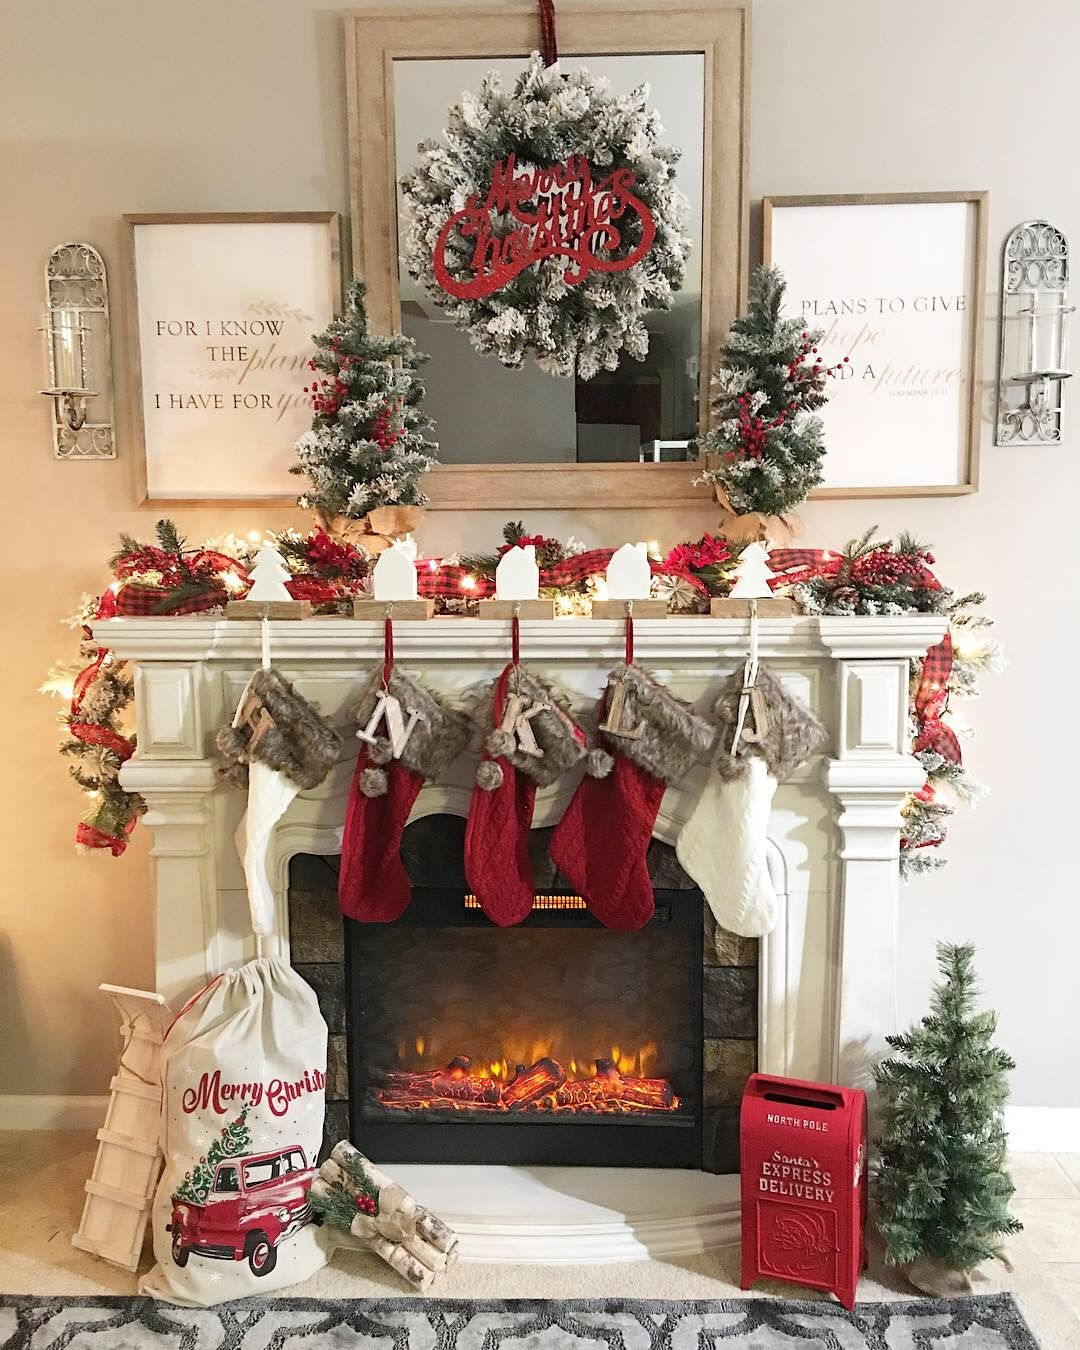 20 Festive Christmas Mantel Ideas   How to Style a Holiday Mantel